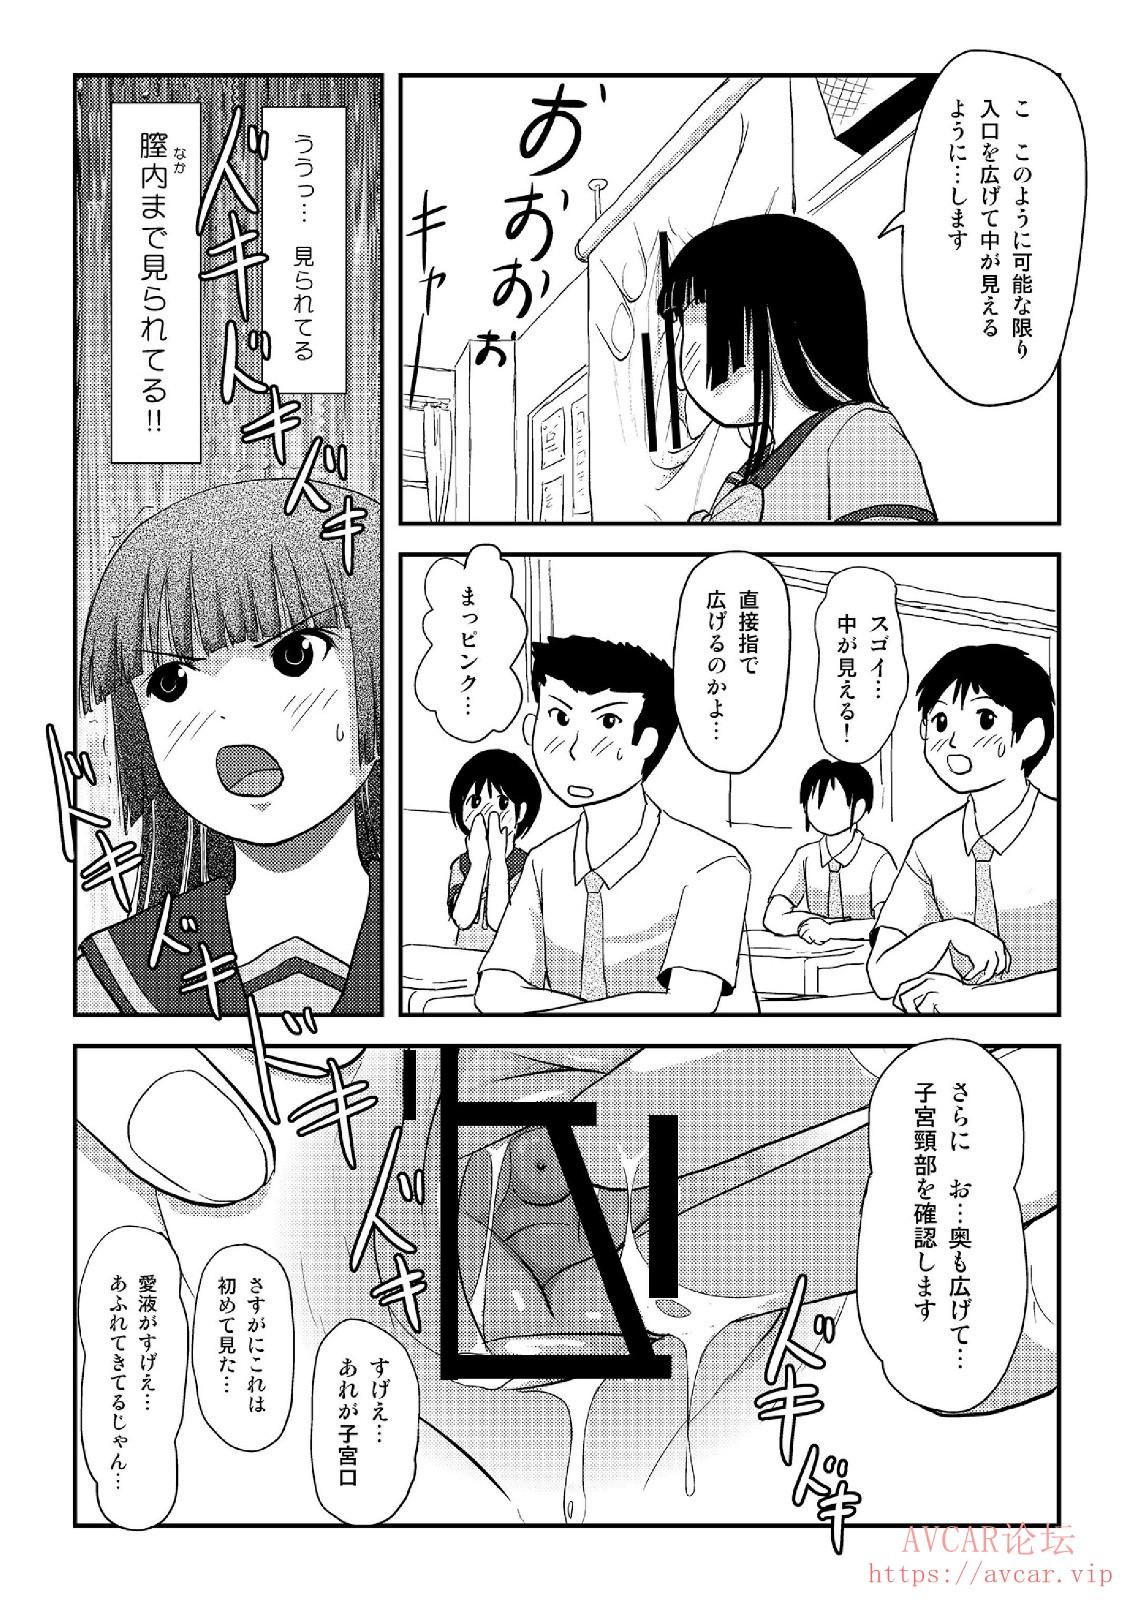 5_page_022.jpg